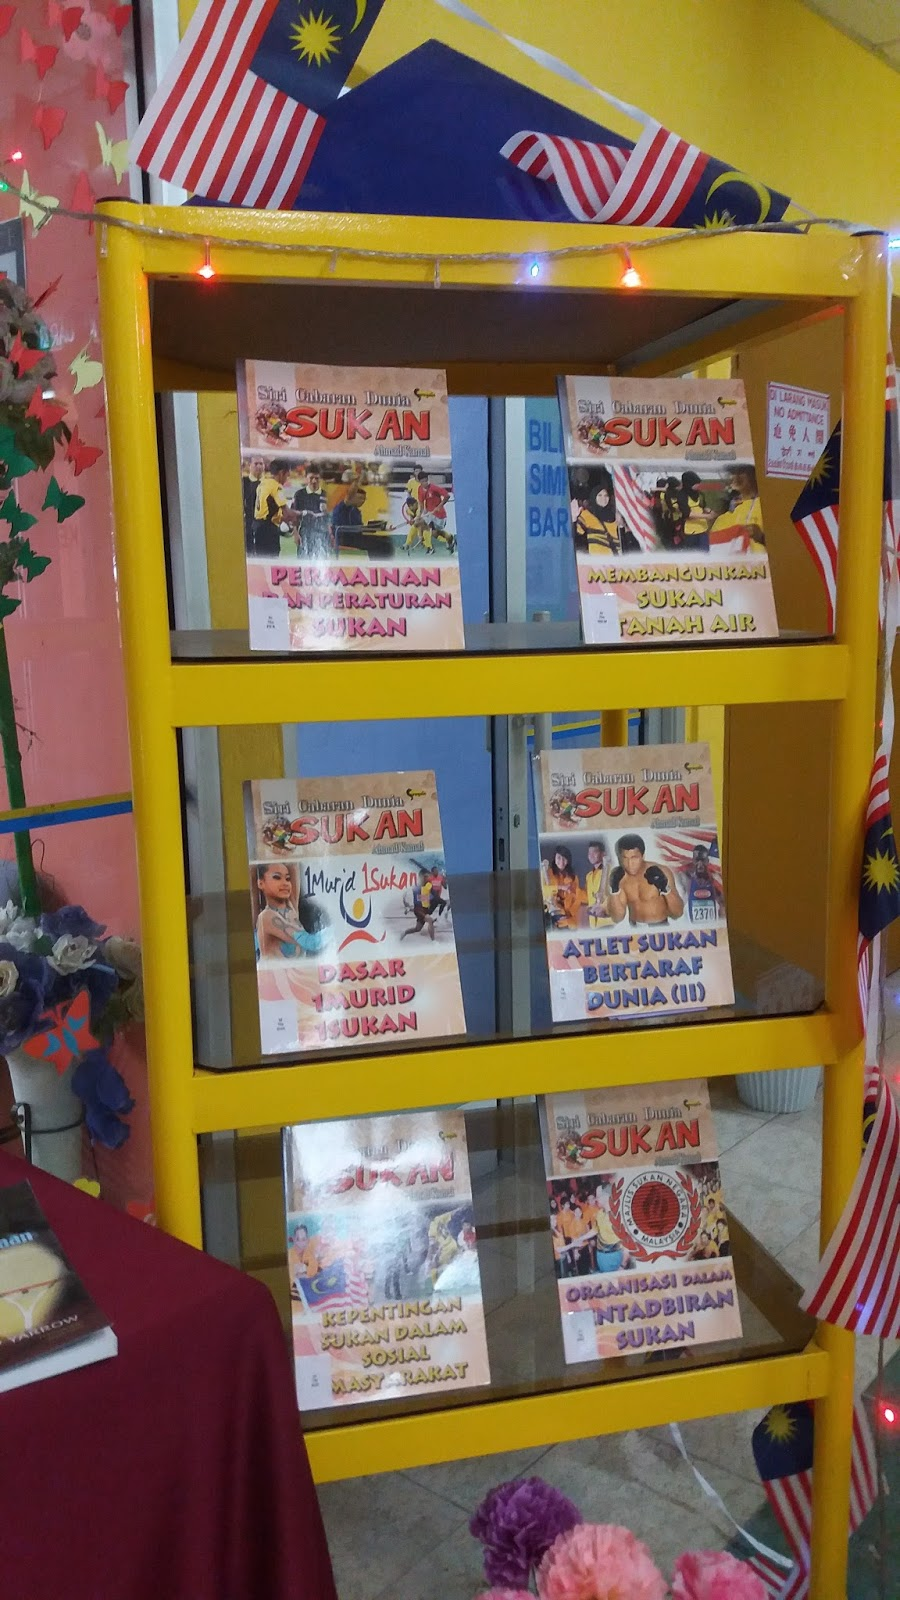 Macam Macam Pameran : macam, pameran, Perpustakaan, Perlis, Cawangan, Simpang, Empar:, Pameran, Bahan, Sukan